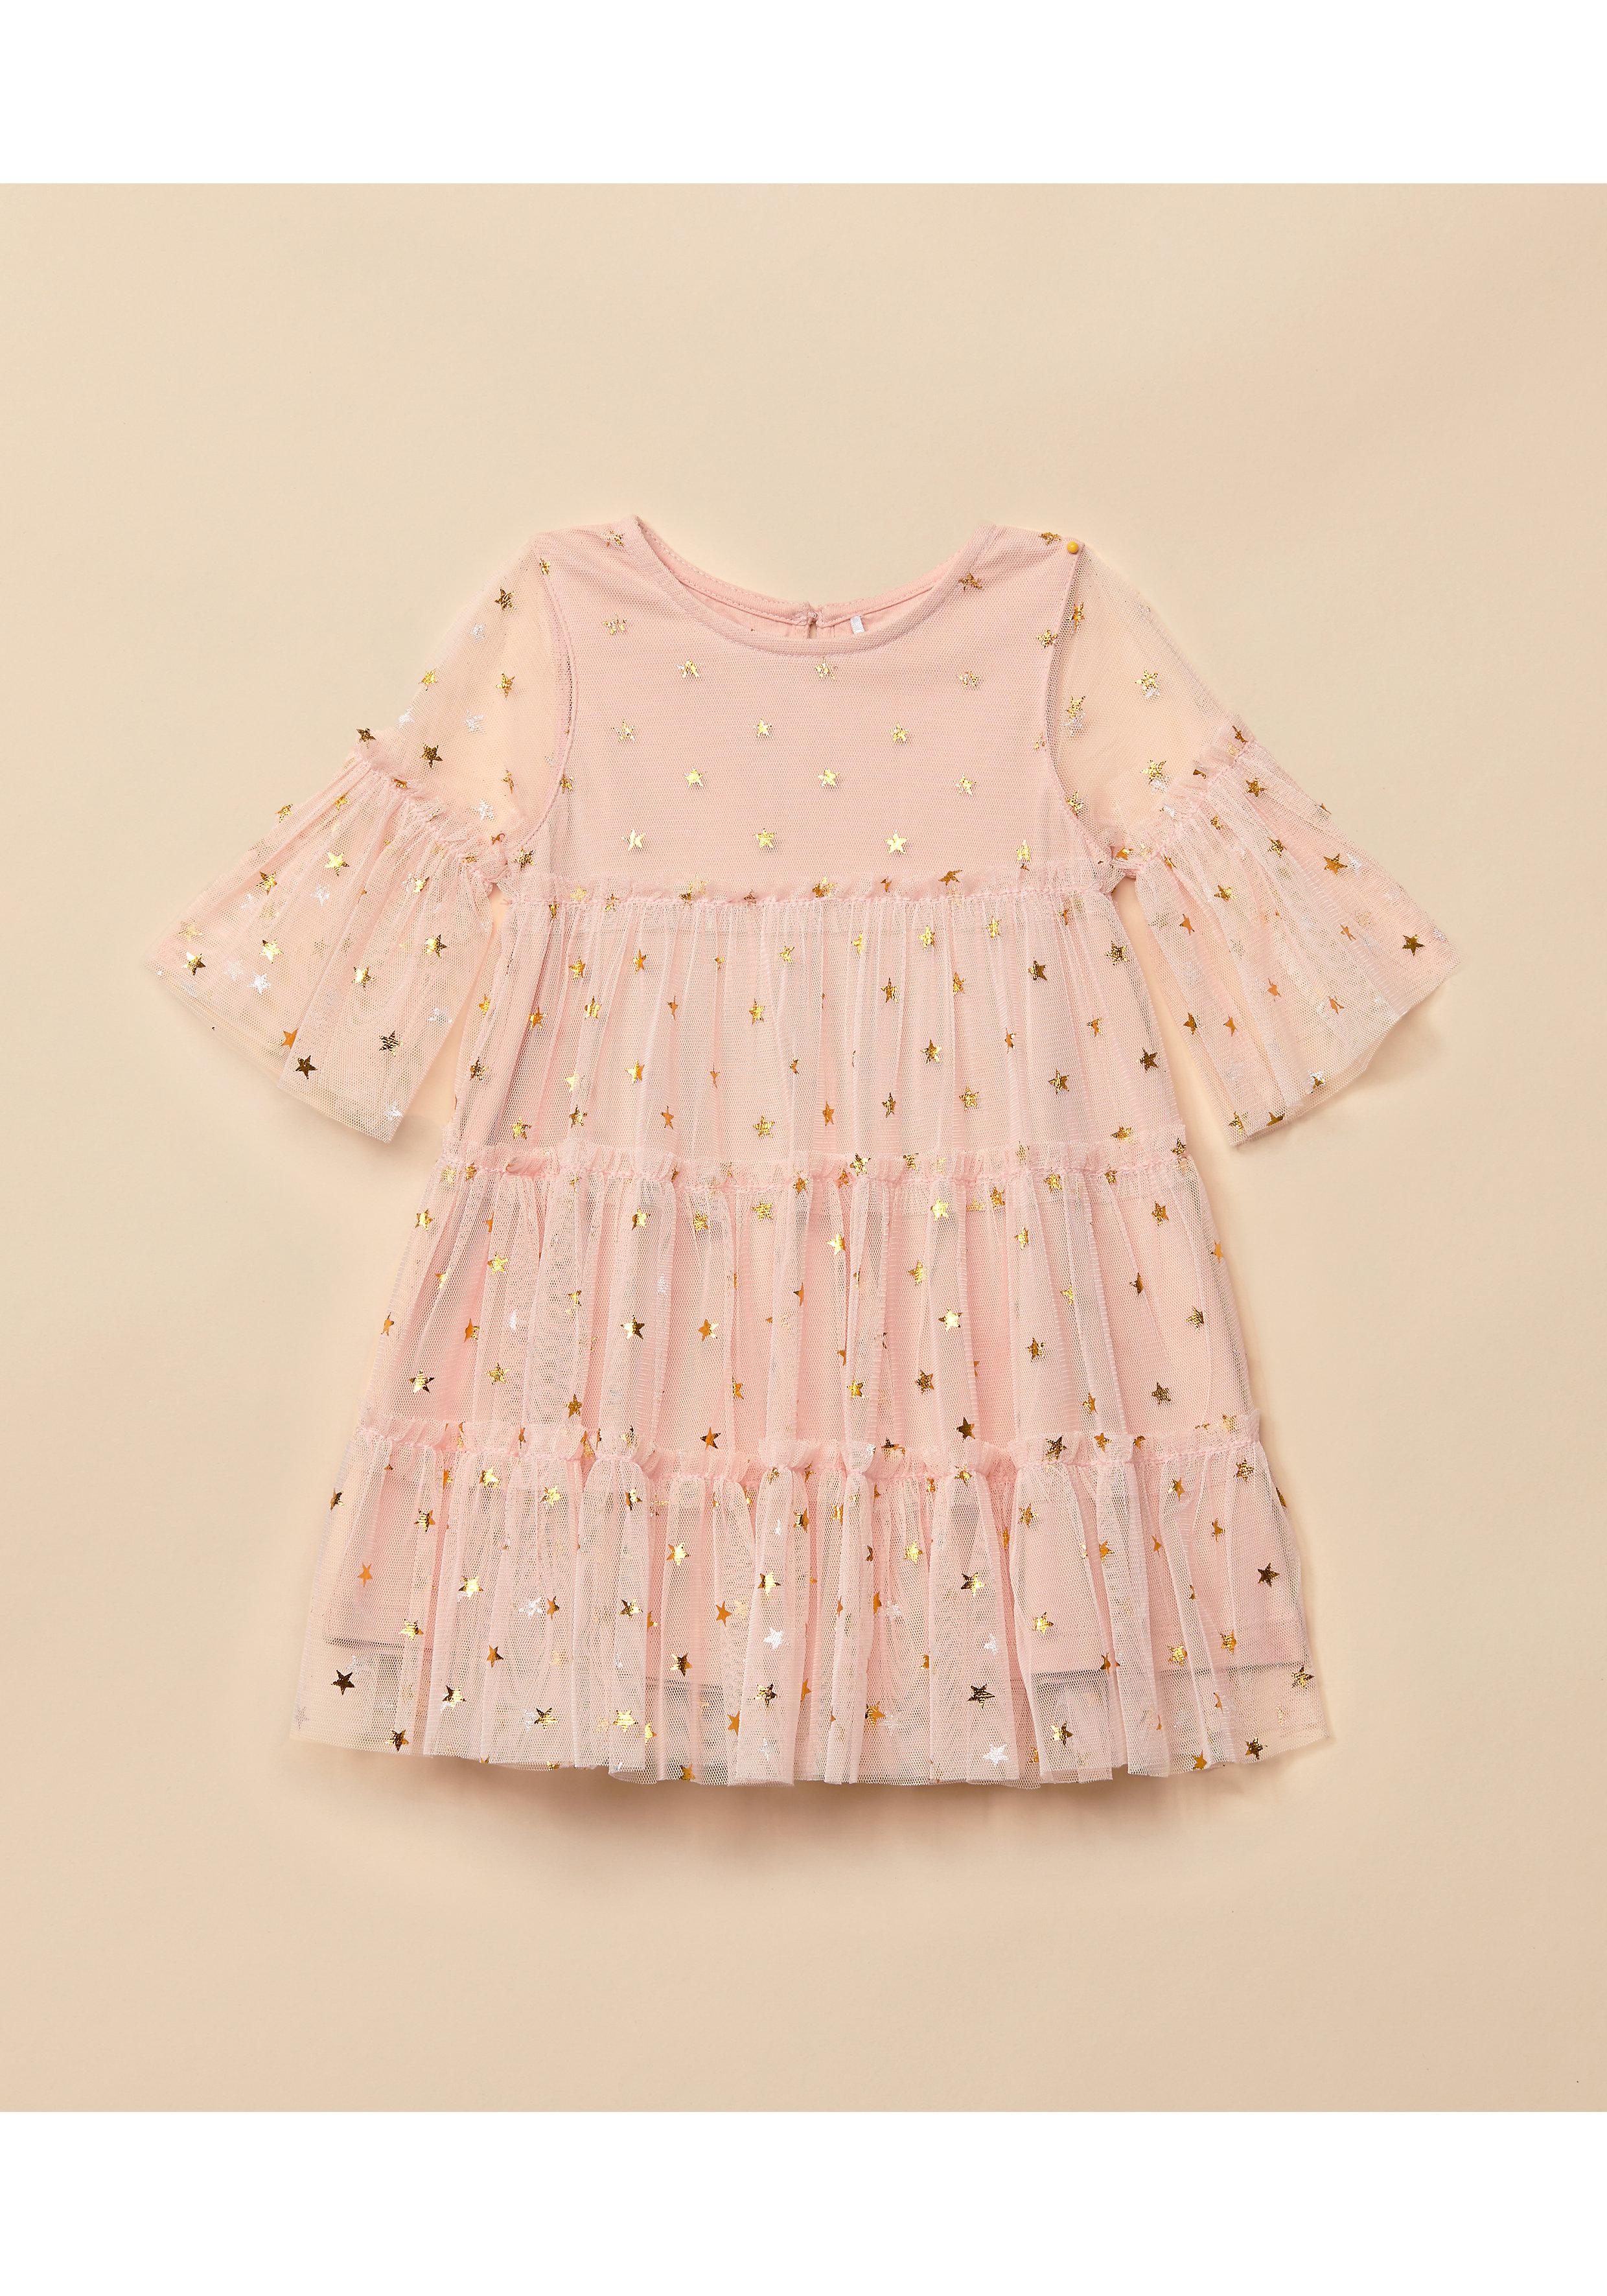 Mothercare | Girls Full Sleeves Sparkle Star Print Mesh Dress - Pink